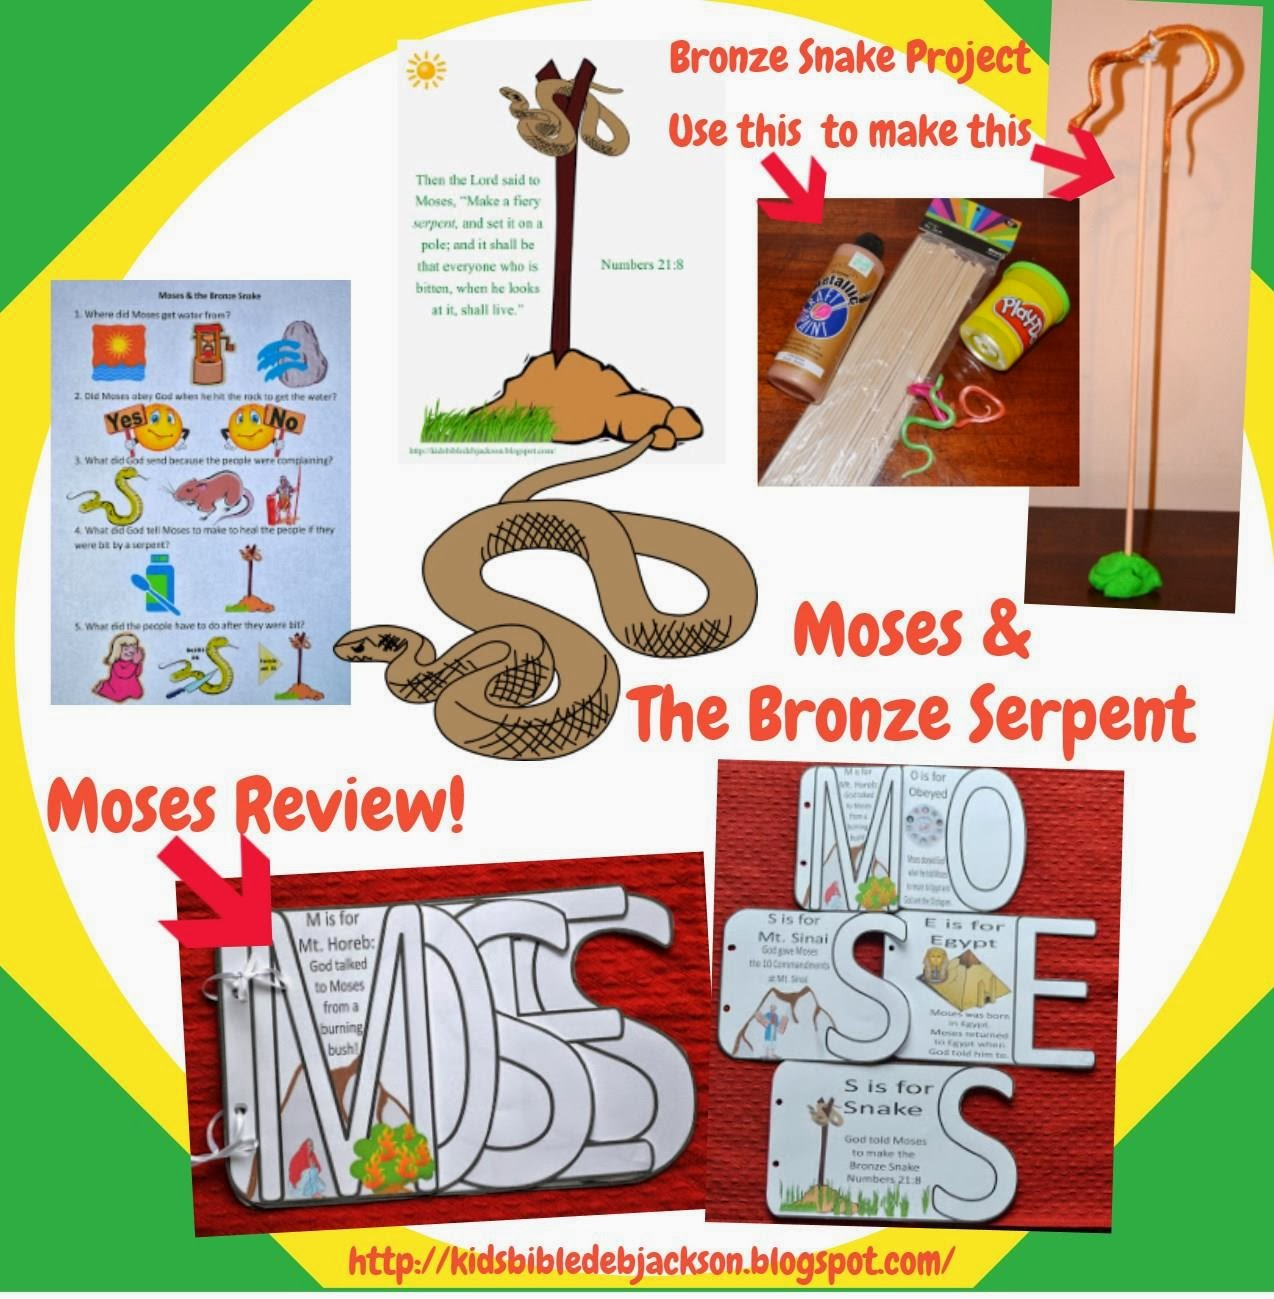 http://kidsbibledebjackson.blogspot.com/2013/11/moses-bronze-snake.html